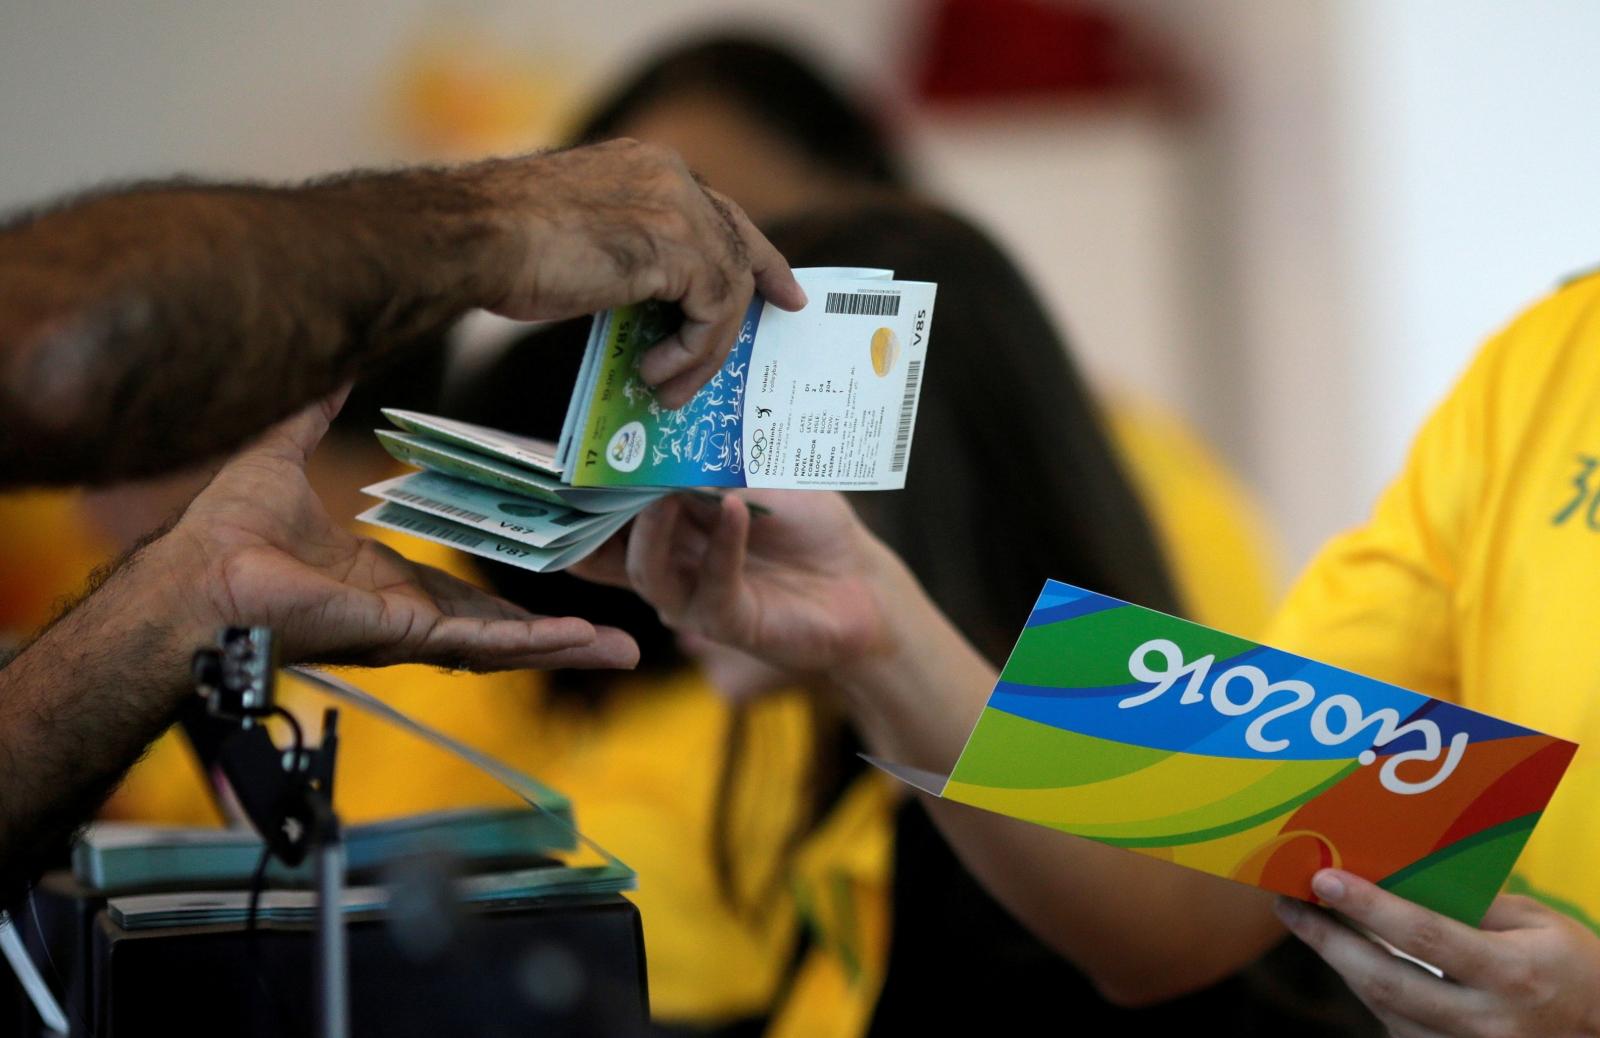 Rio 2016 Olympic Tickets